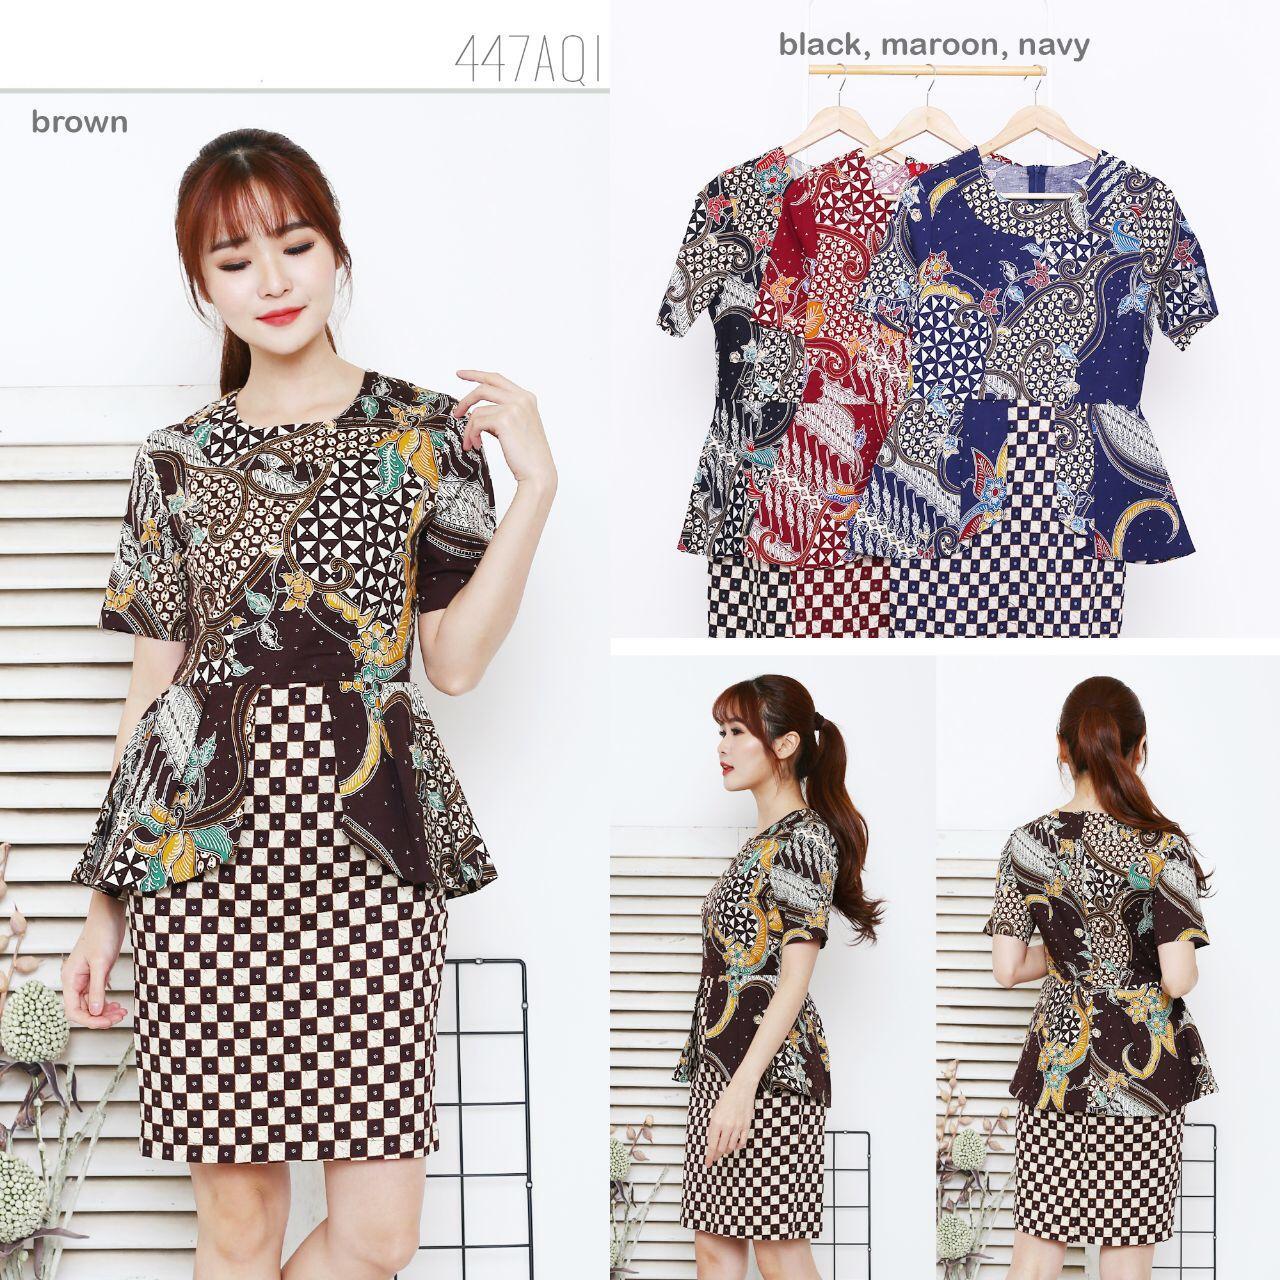 Harga Batik Terbaru 2018 Agrapana Blouse Print Aradhana Hitam Xl Dress 447 Aqi